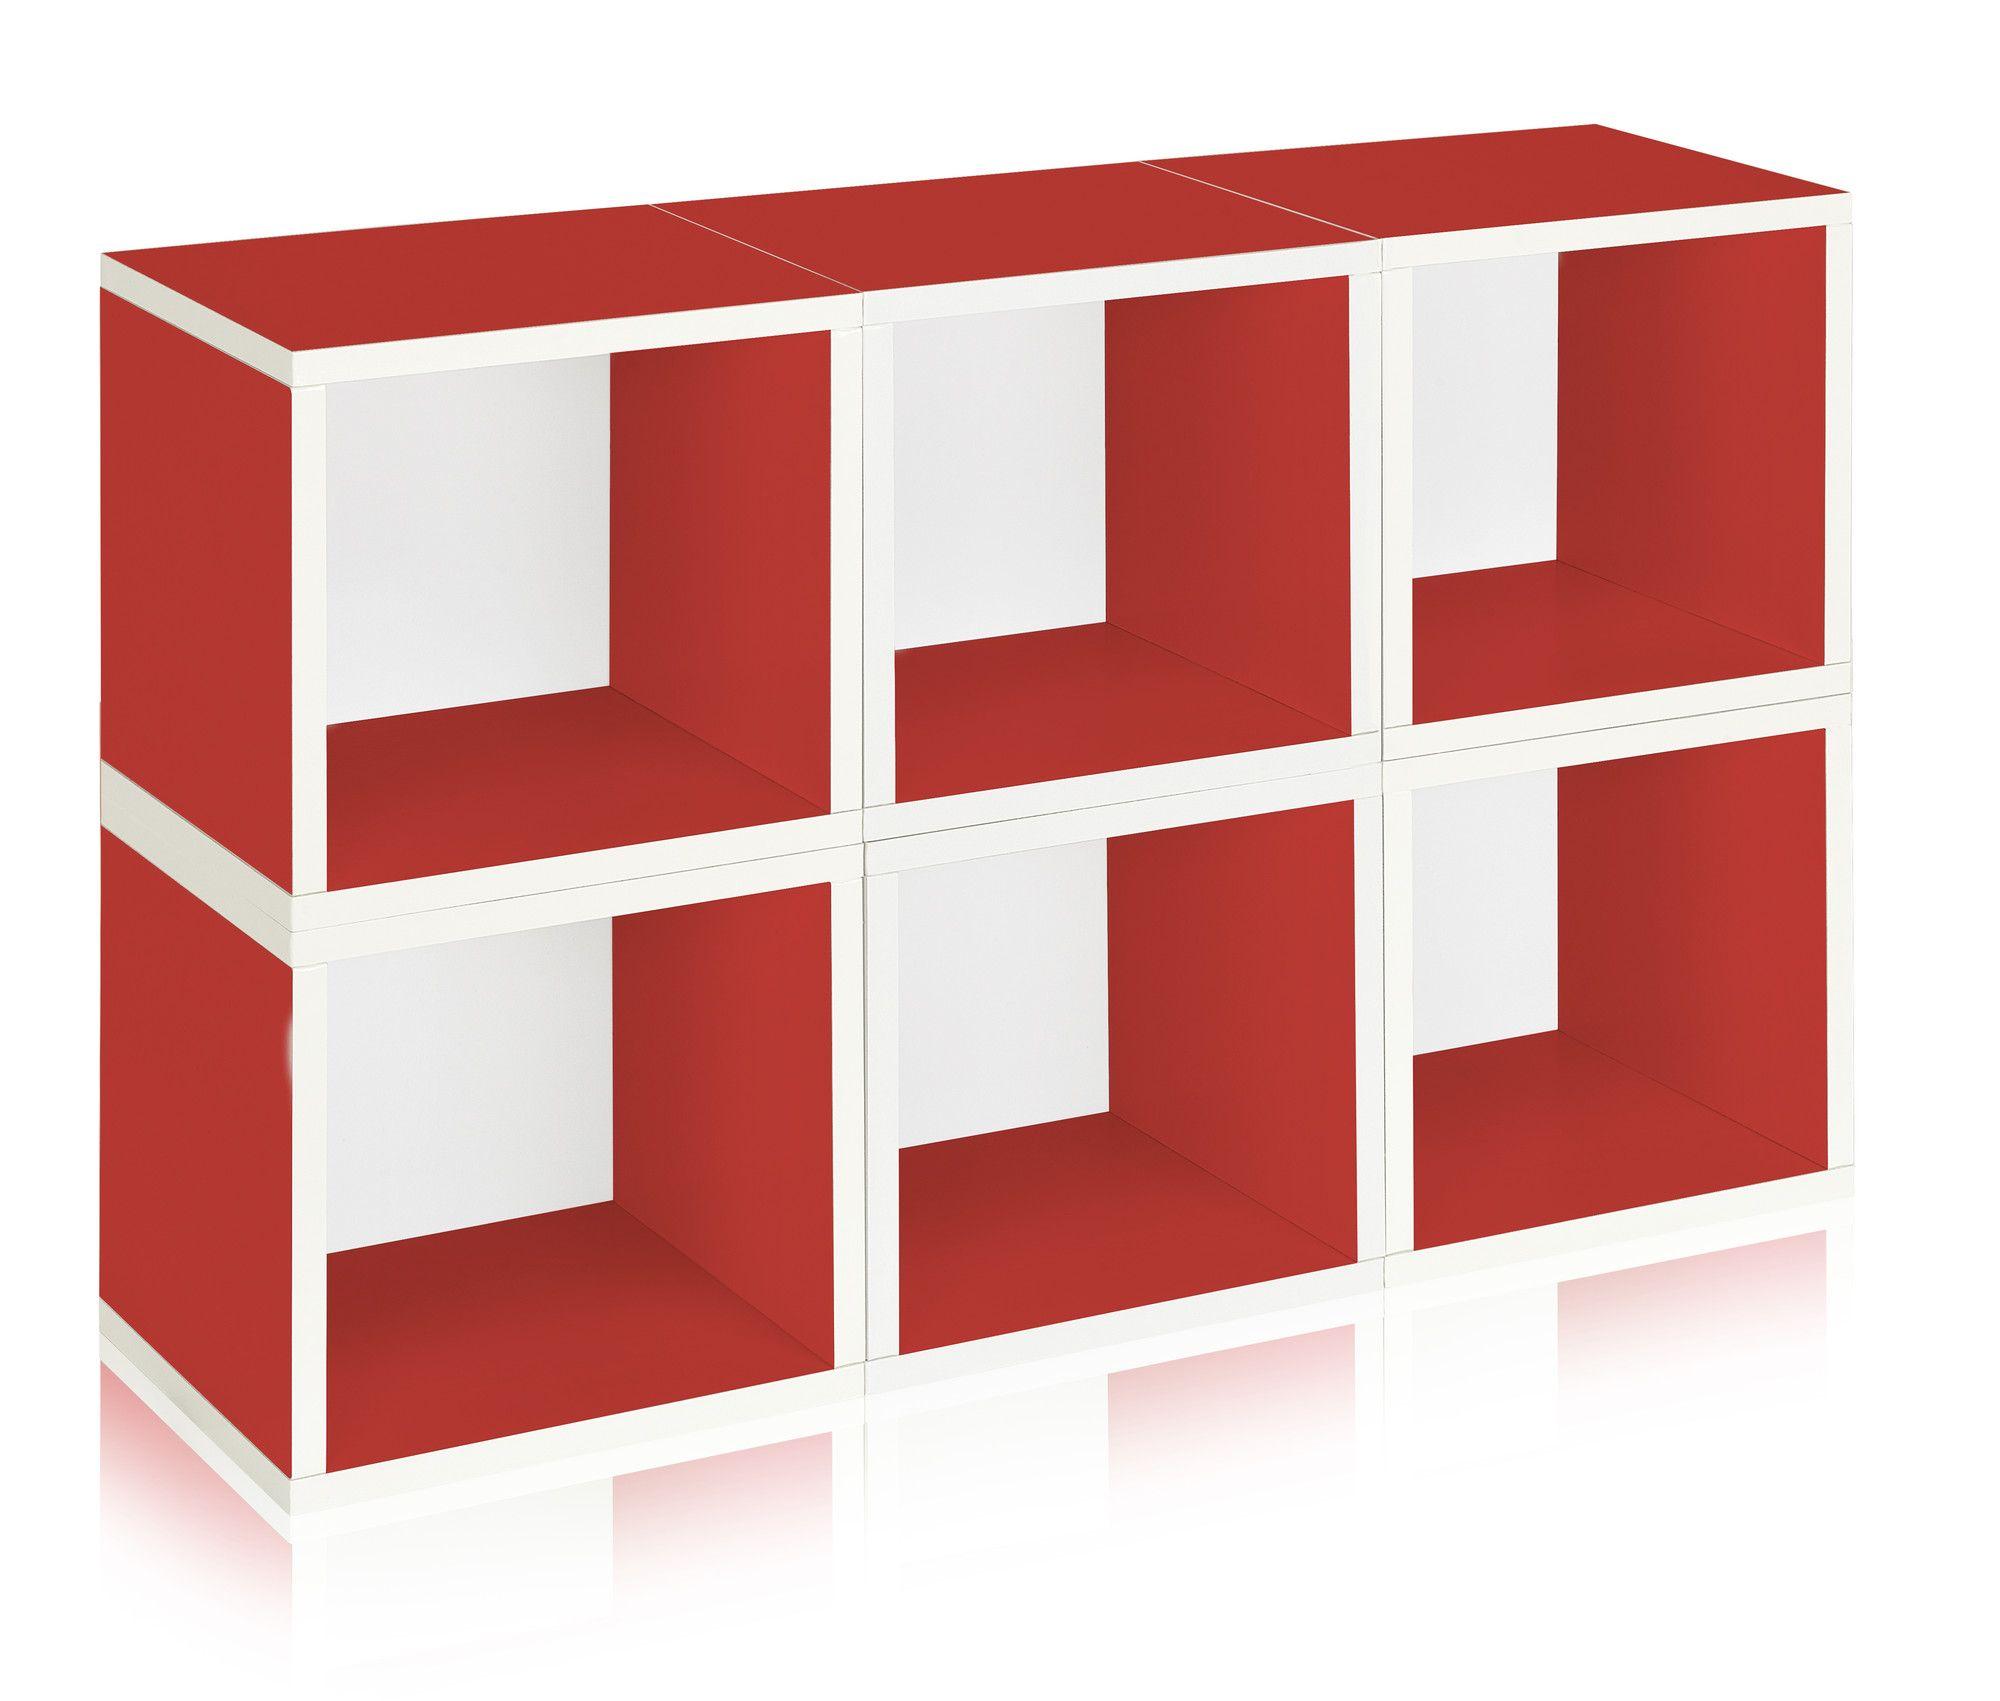 zBoard Storage Stackable and Modular Organizer 26  Cube Unit Bookcase  sc 1 st  Pinterest & zBoard Storage Stackable and Modular Organizer 26